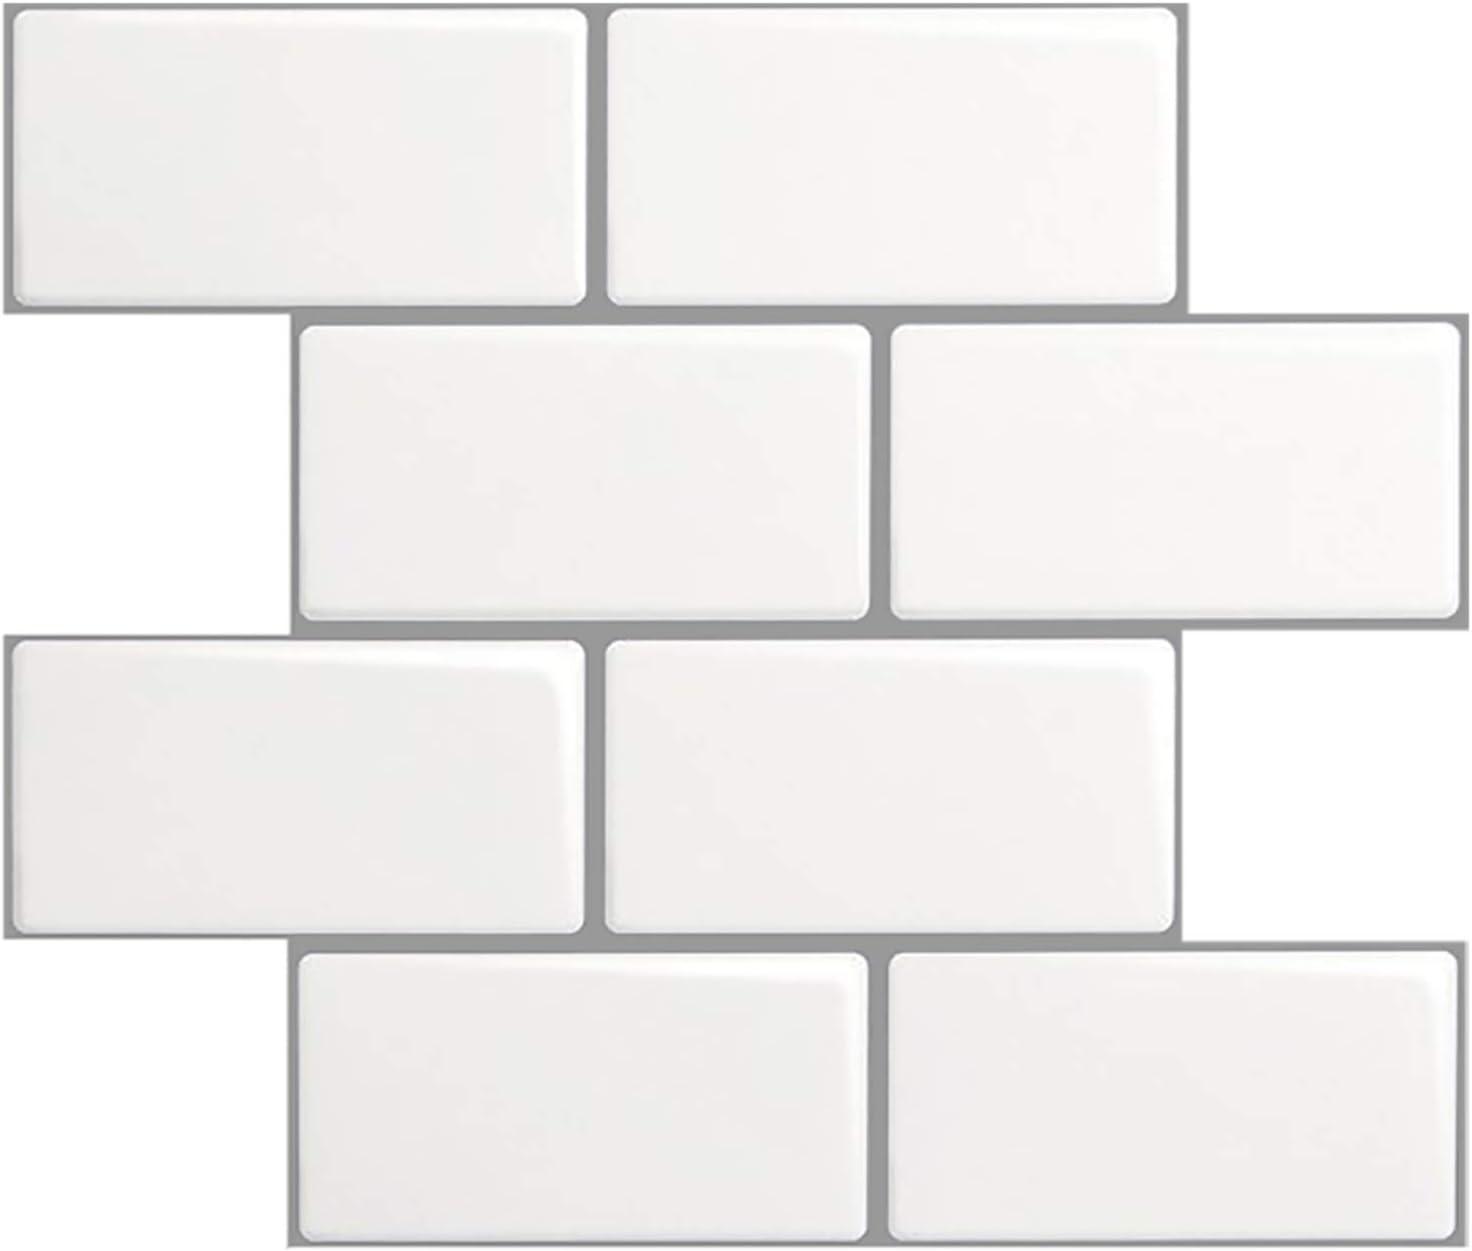 Art3d 10 SF Self-Adhesive Backsplash Tiles, Faux Marble Tiles (A601, Thicker Design)